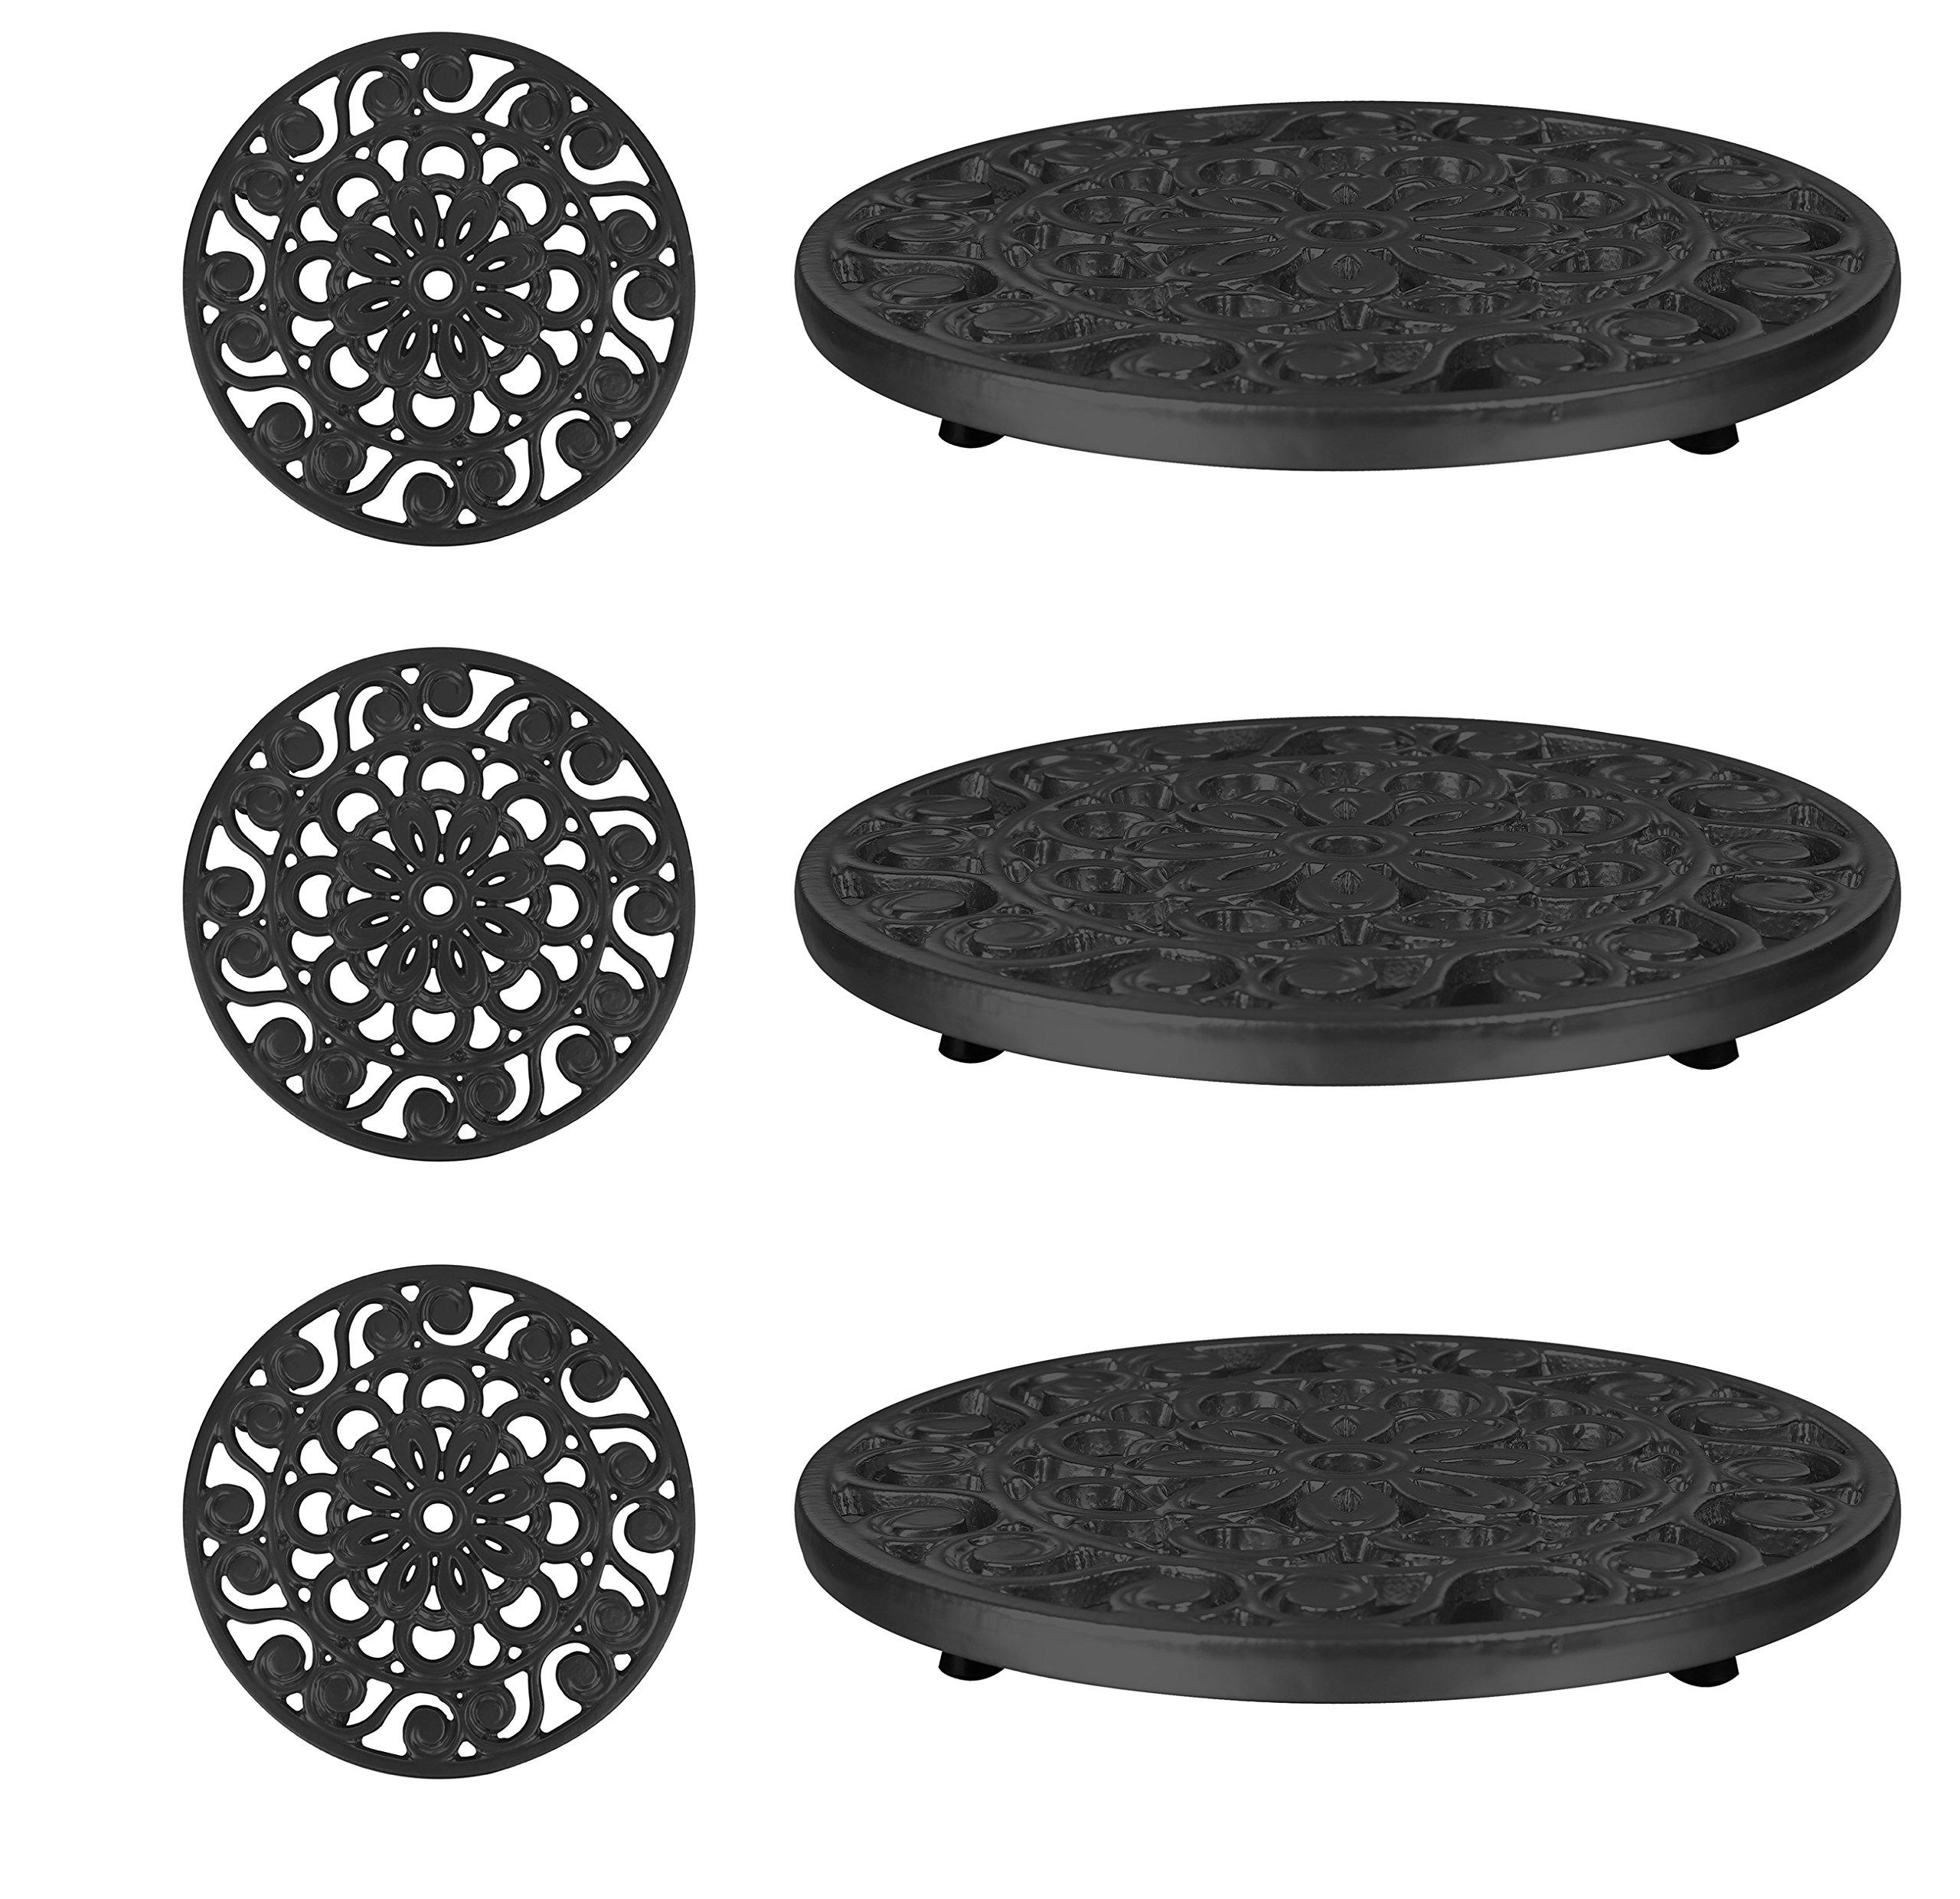 Trademark Innovations Set of 3 Decorative Cast Iron Metal Trivets (Black) by Trademark Innovations